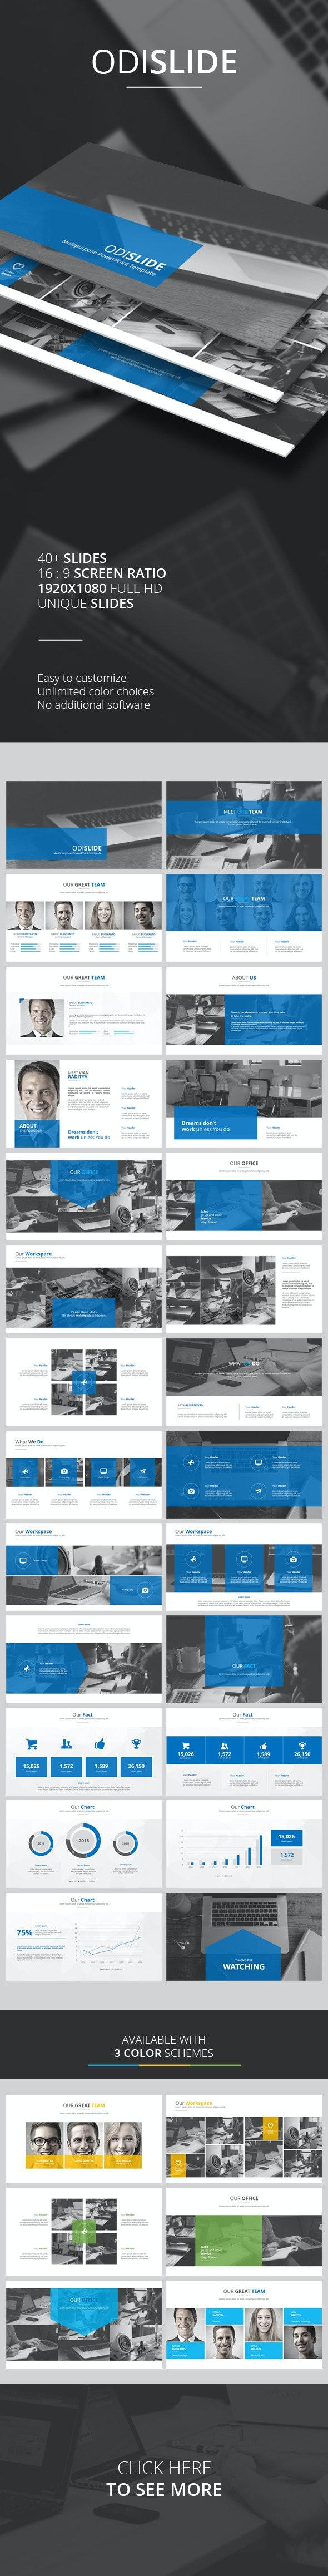 Odislide PowerPoint Template - PowerPoint Templates Presentation Templates